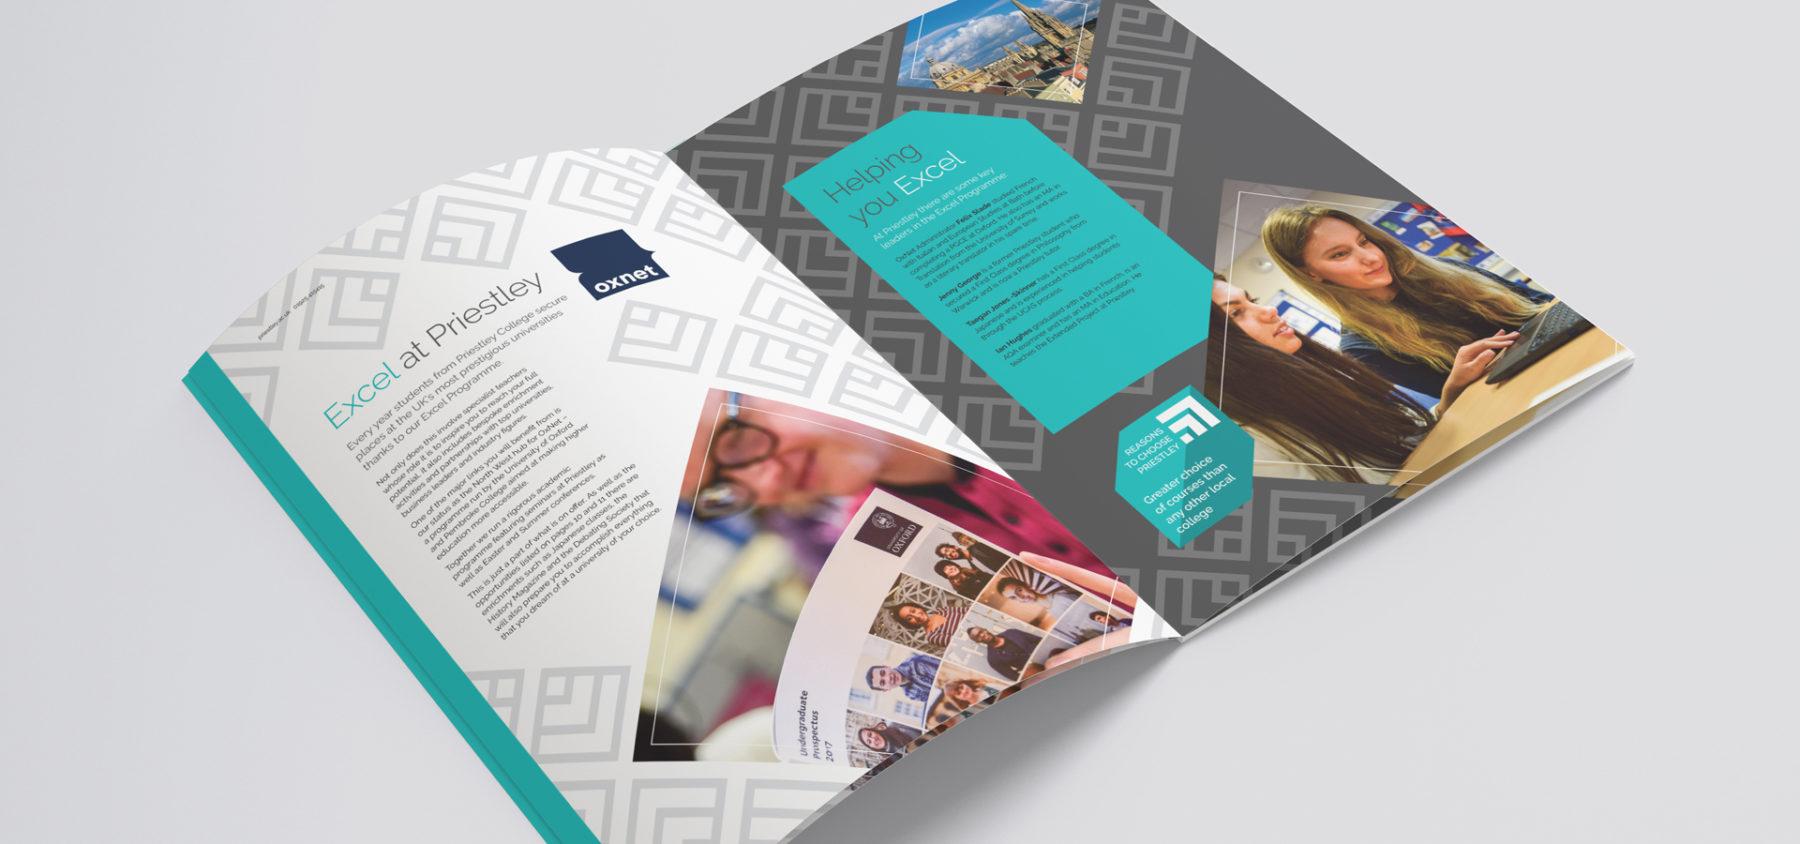 Priestley College Prospectus 2021